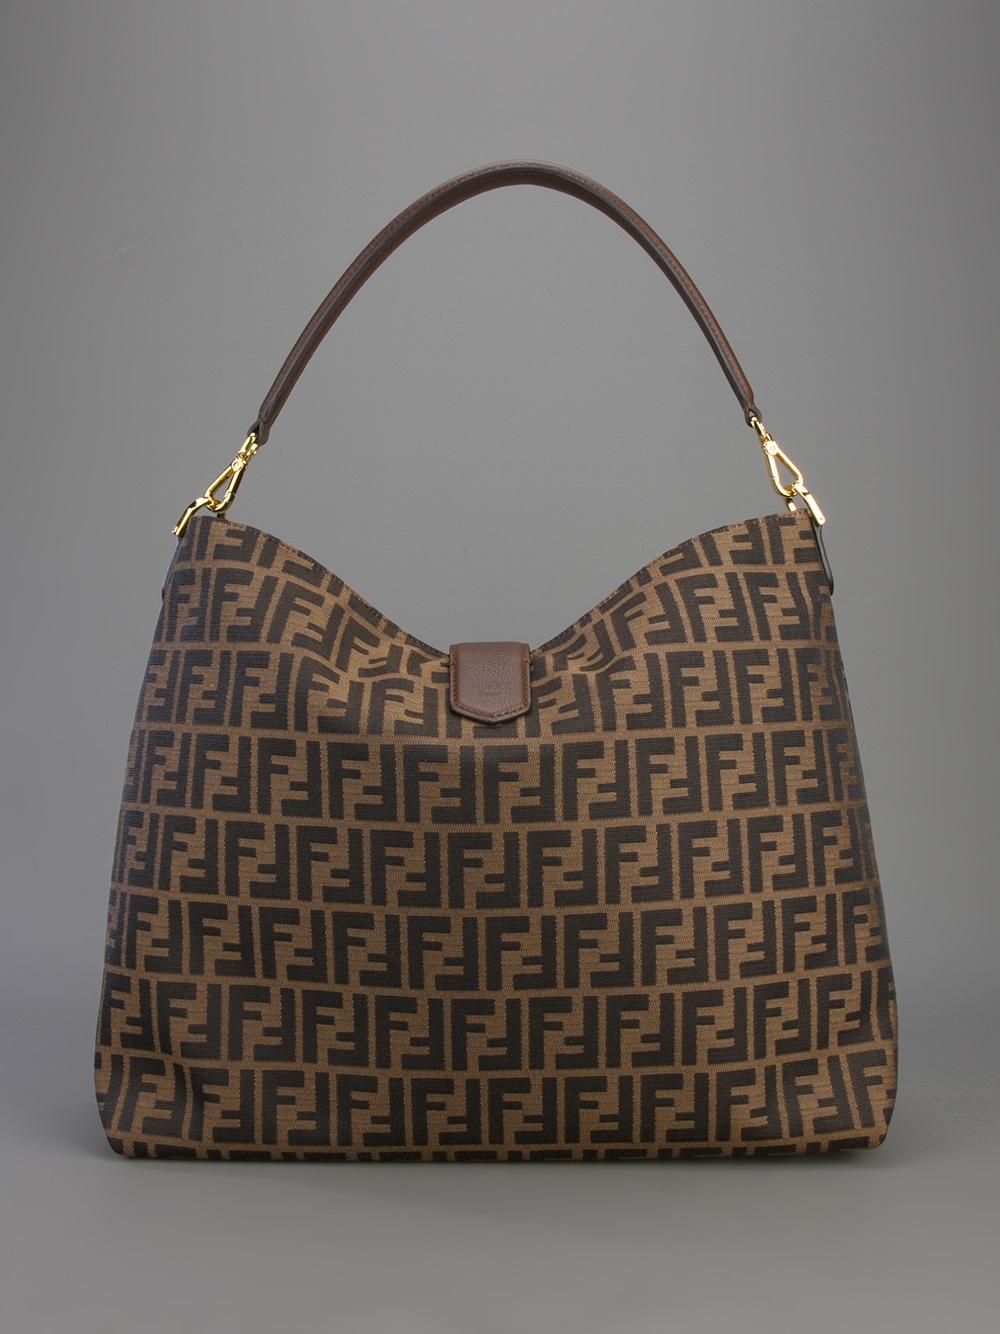 Fendi Classic Hobo Tote Bag in Brown